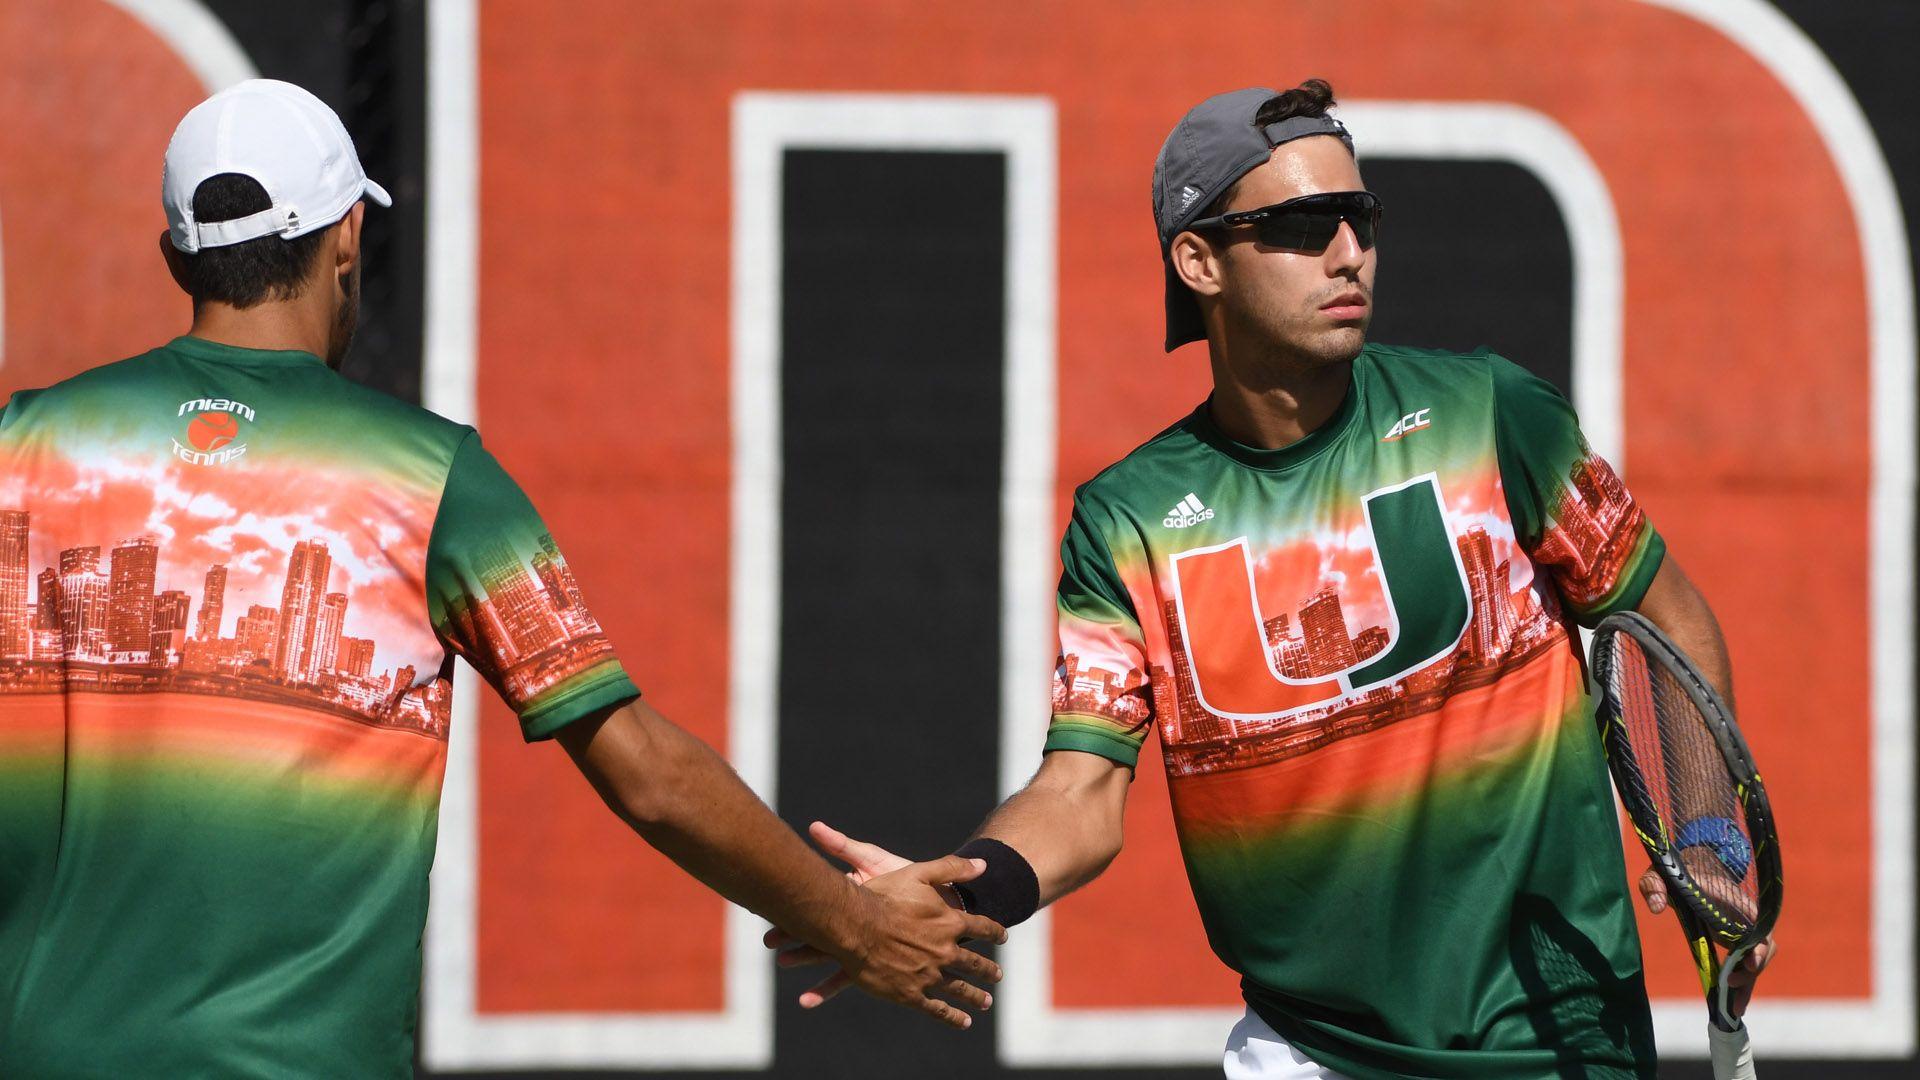 Men's Tennis Wraps up First Day of Miami Spring Invite